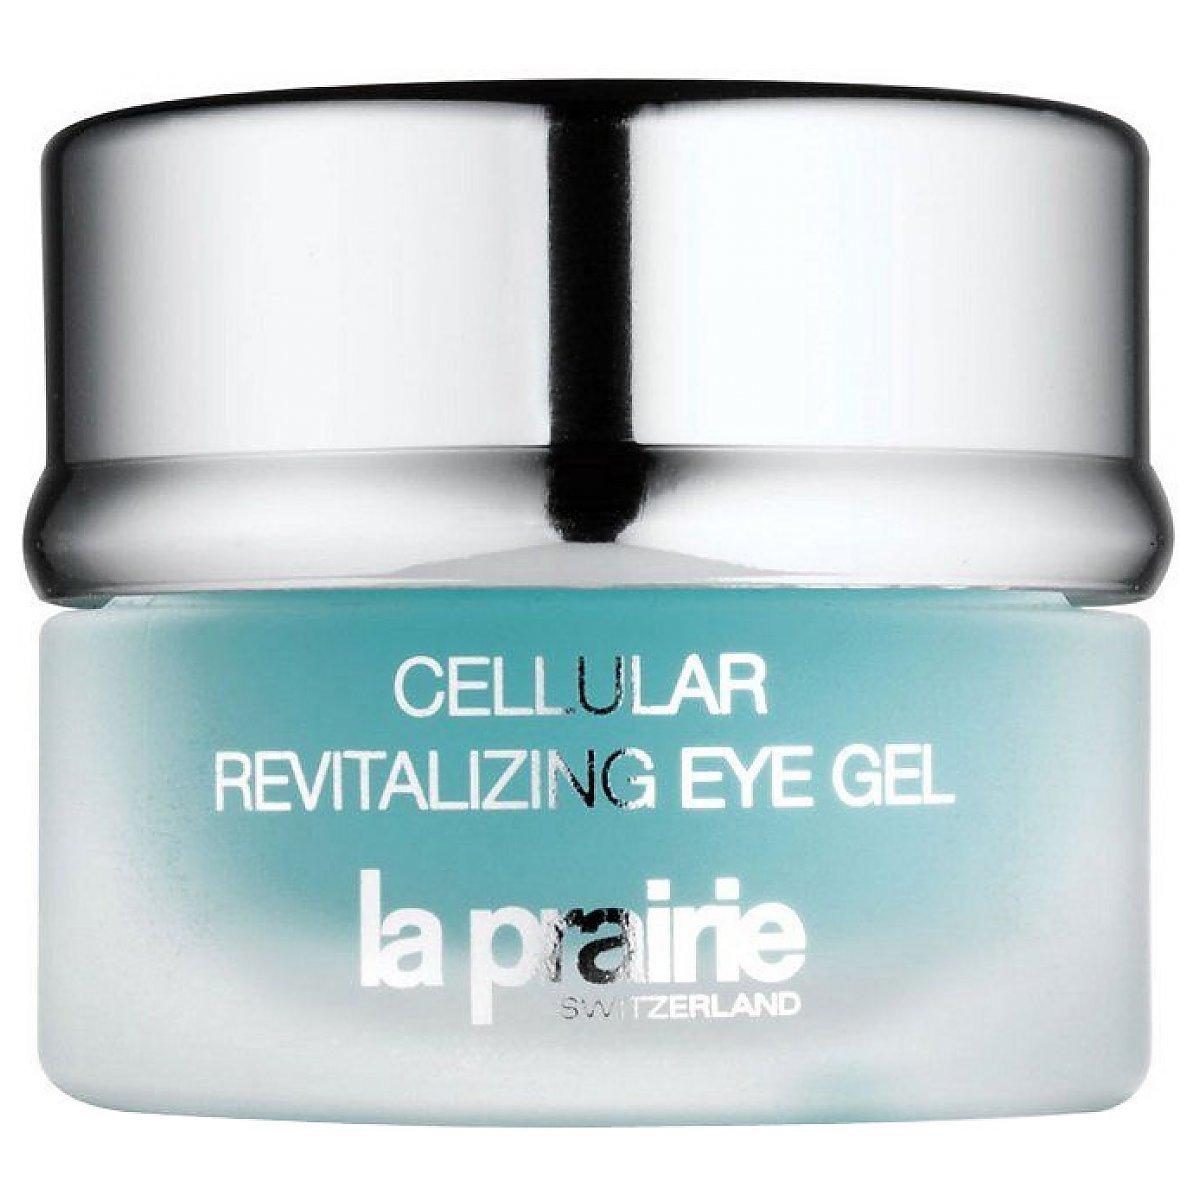 la prairie cellular revitalizing eye gel review